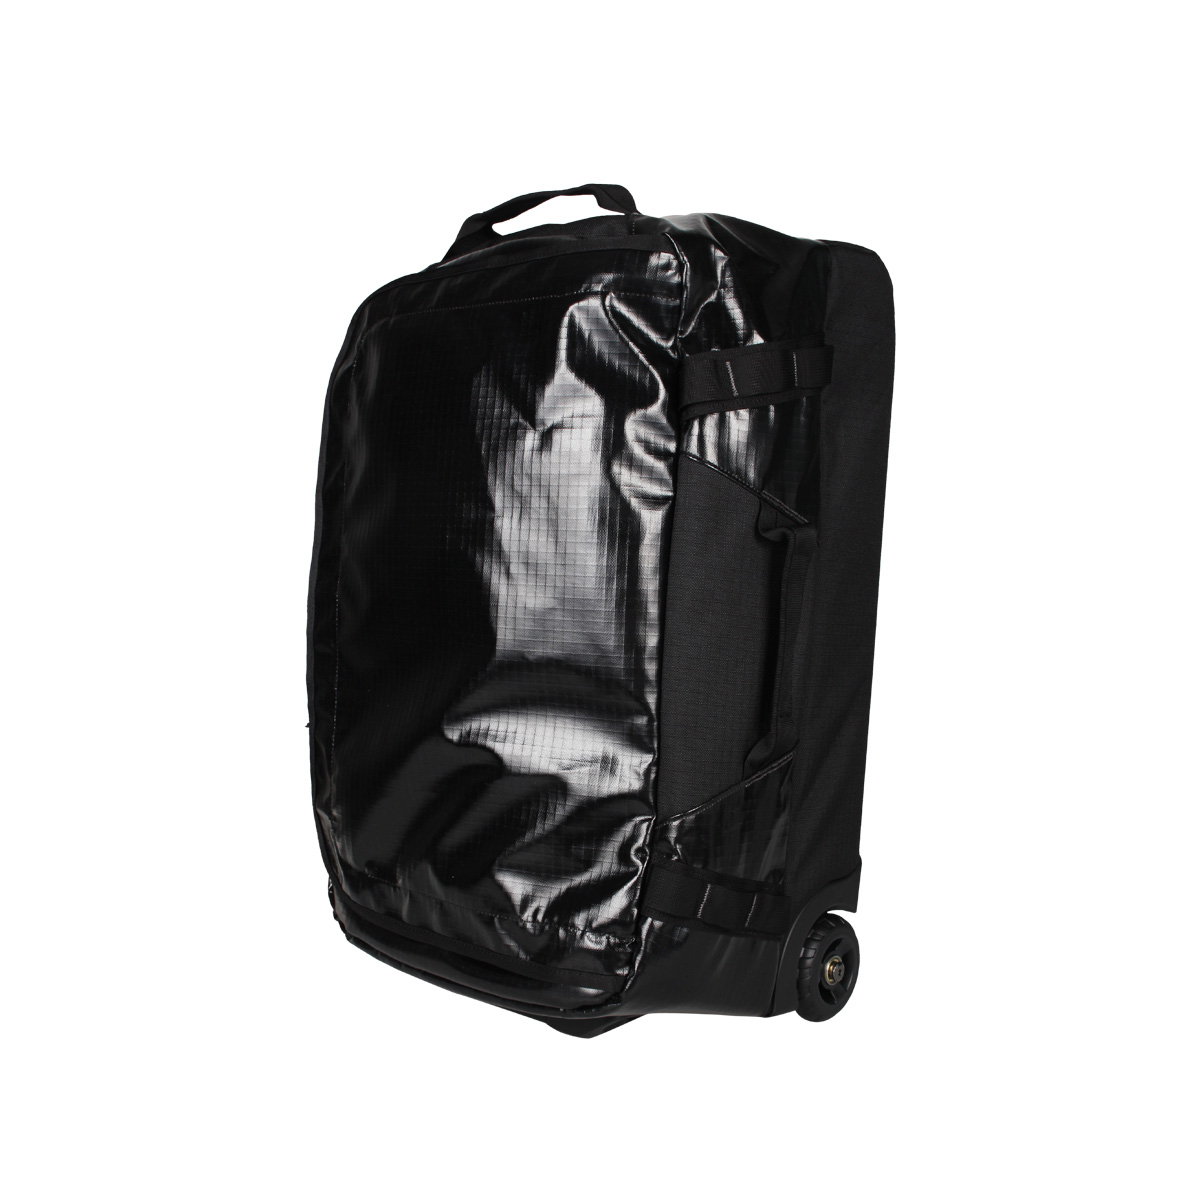 patagonia BLACK HOLE WHEELED DUFFEL パタゴニア ダッフル バッグ キャリーケース キャリーバッグ スーツケース ブラックホール ウィールド メンズ レディース 撥水 40L ブラック ネイビー 黒 49378 [7/27 新入荷]